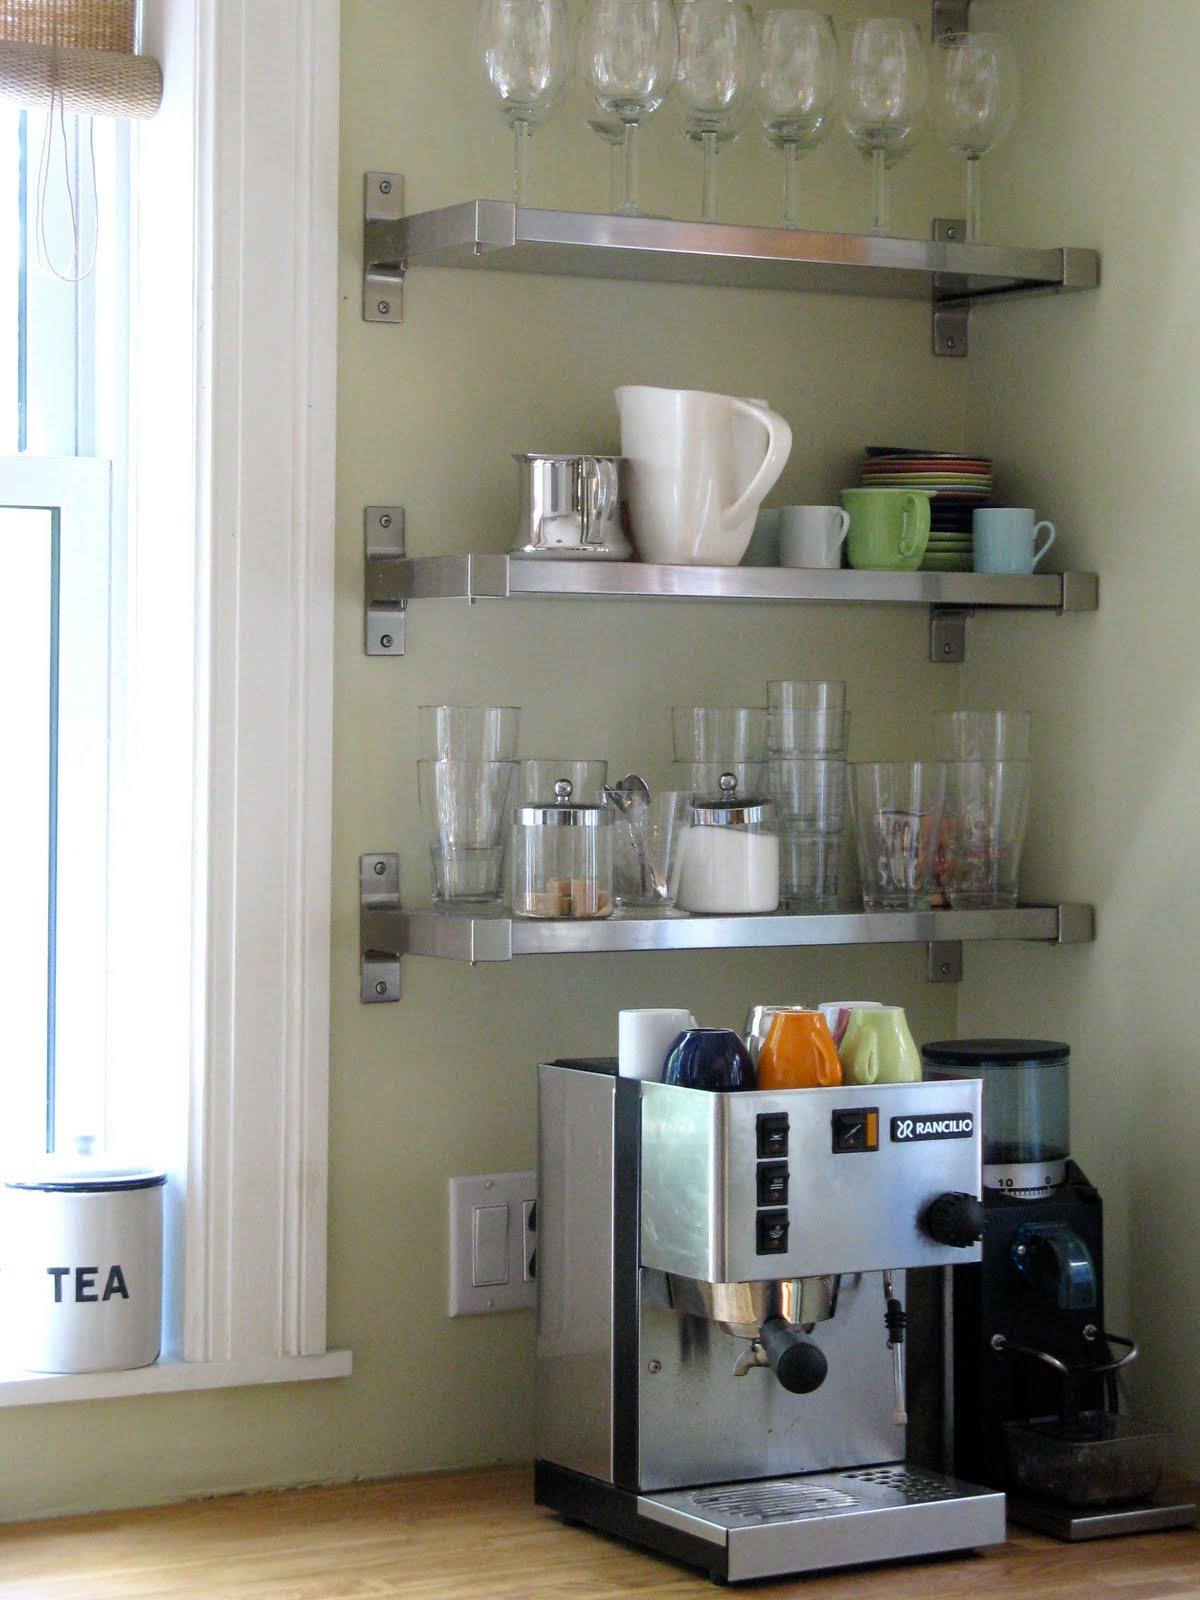 Pour toujours the kitchen and office corner la cuisine - Coin cuisine ikea ...